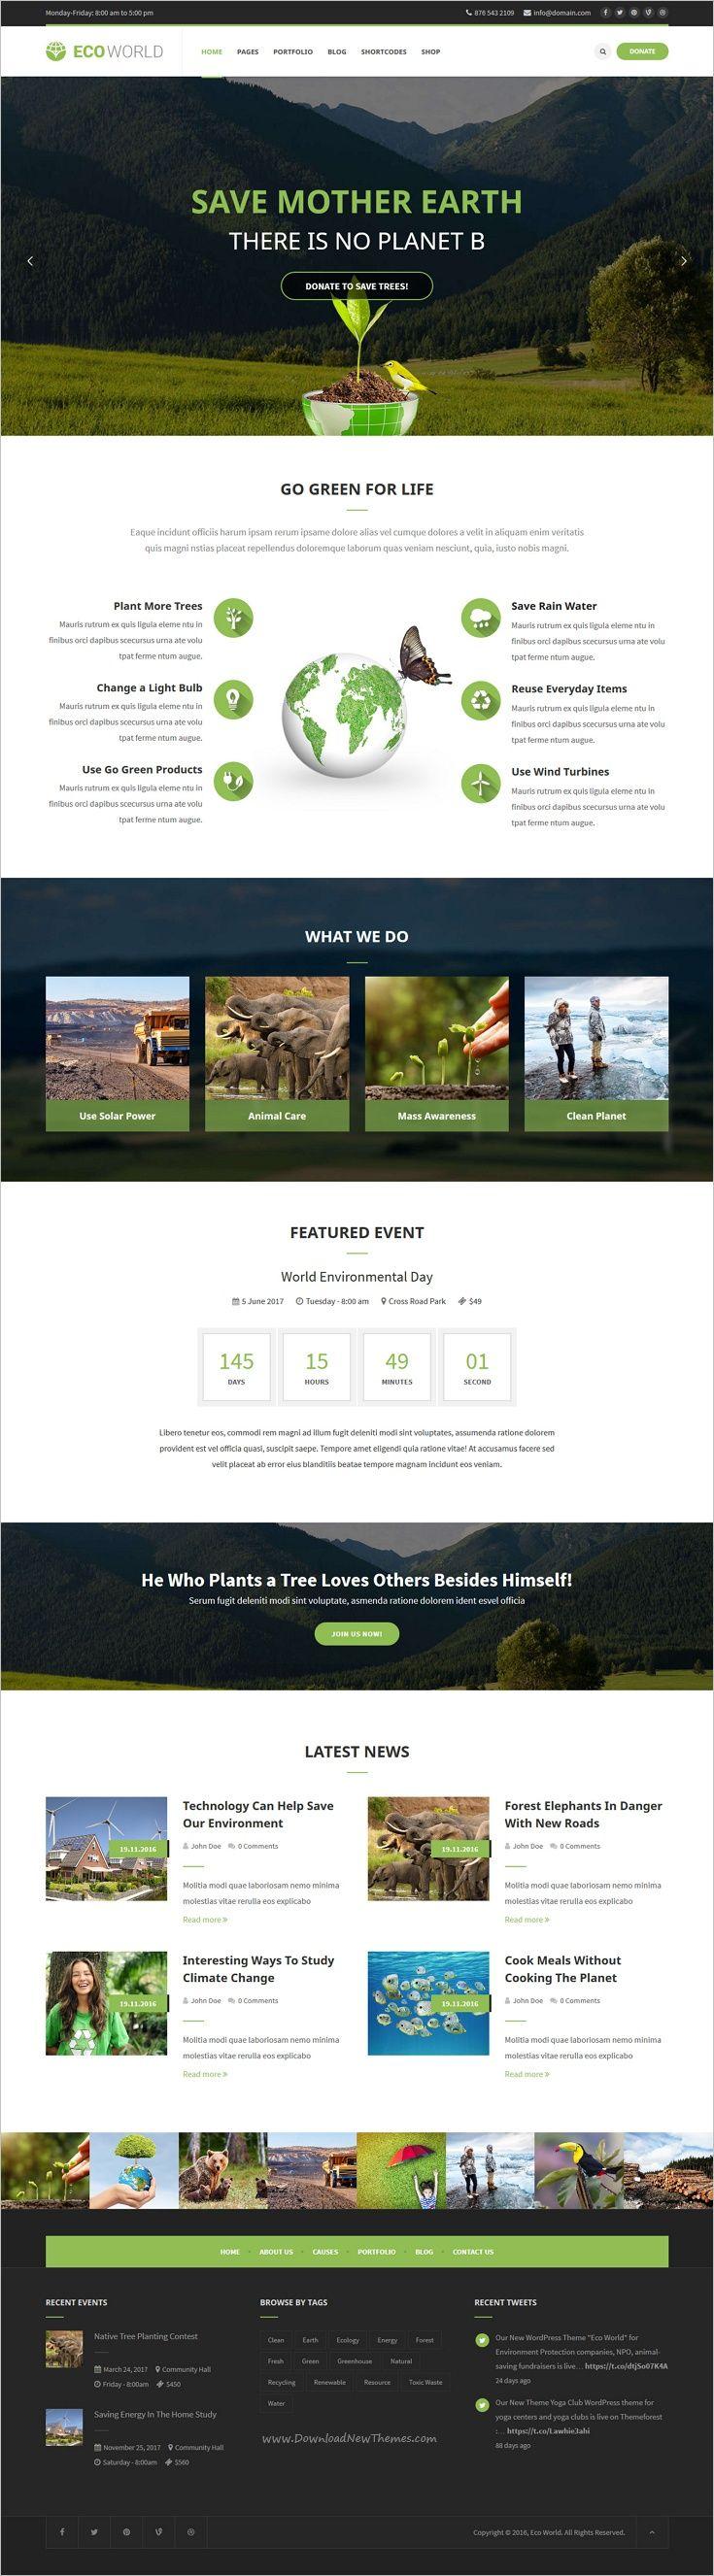 Eco World is a wonderful responsive #WordPress theme for #environment protection companies or nonprofit #organizations website download now➩ https://themeforest.net/item/eco-world-nature-ecology-ngo-wordpress-theme/18967402?ref=Datasata